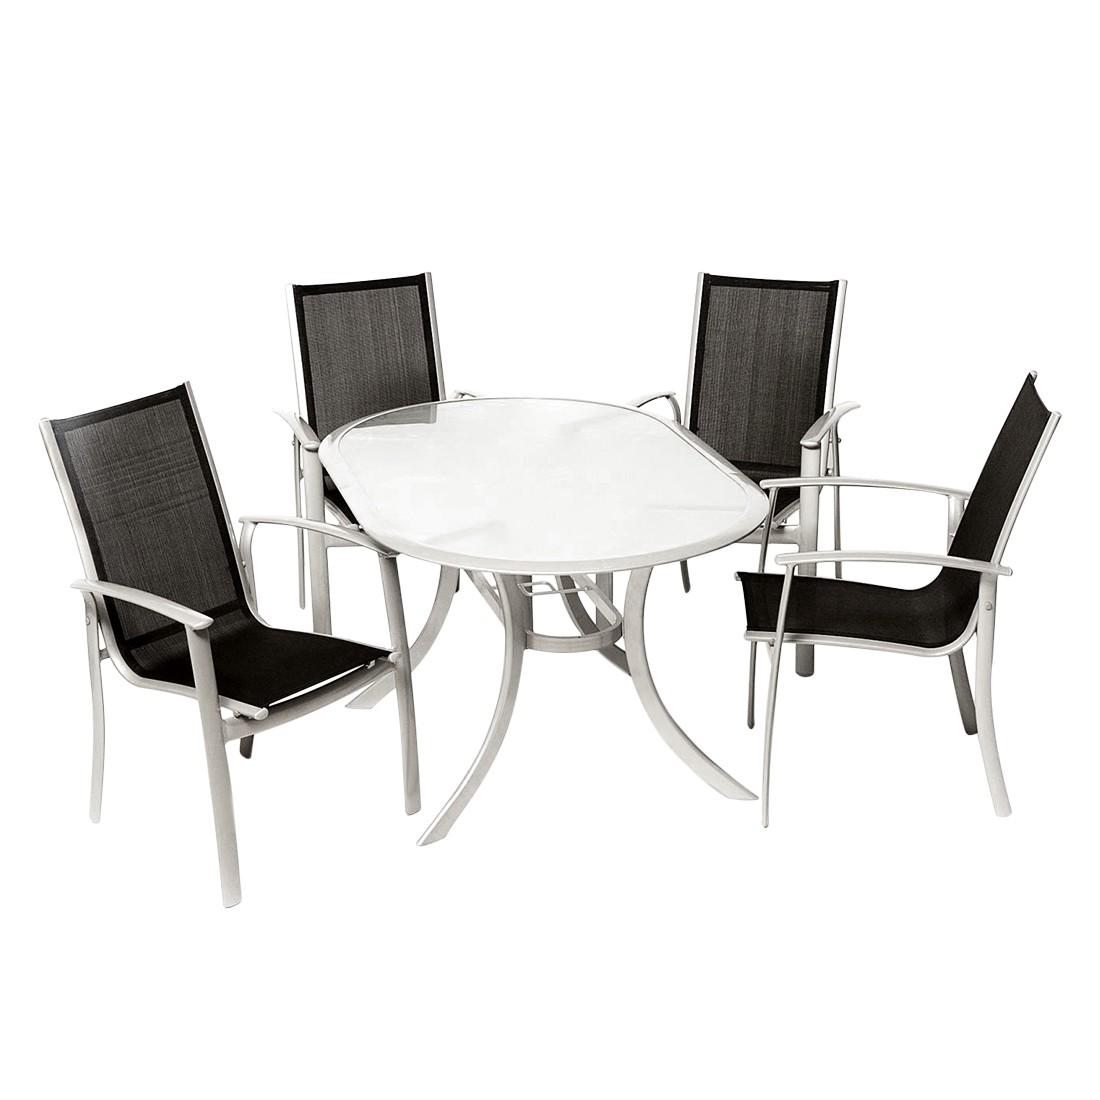 Gartensitzgruppe Carrara V (5-teilig) | Garten | Schwarz | Glas - Metall | Merxx